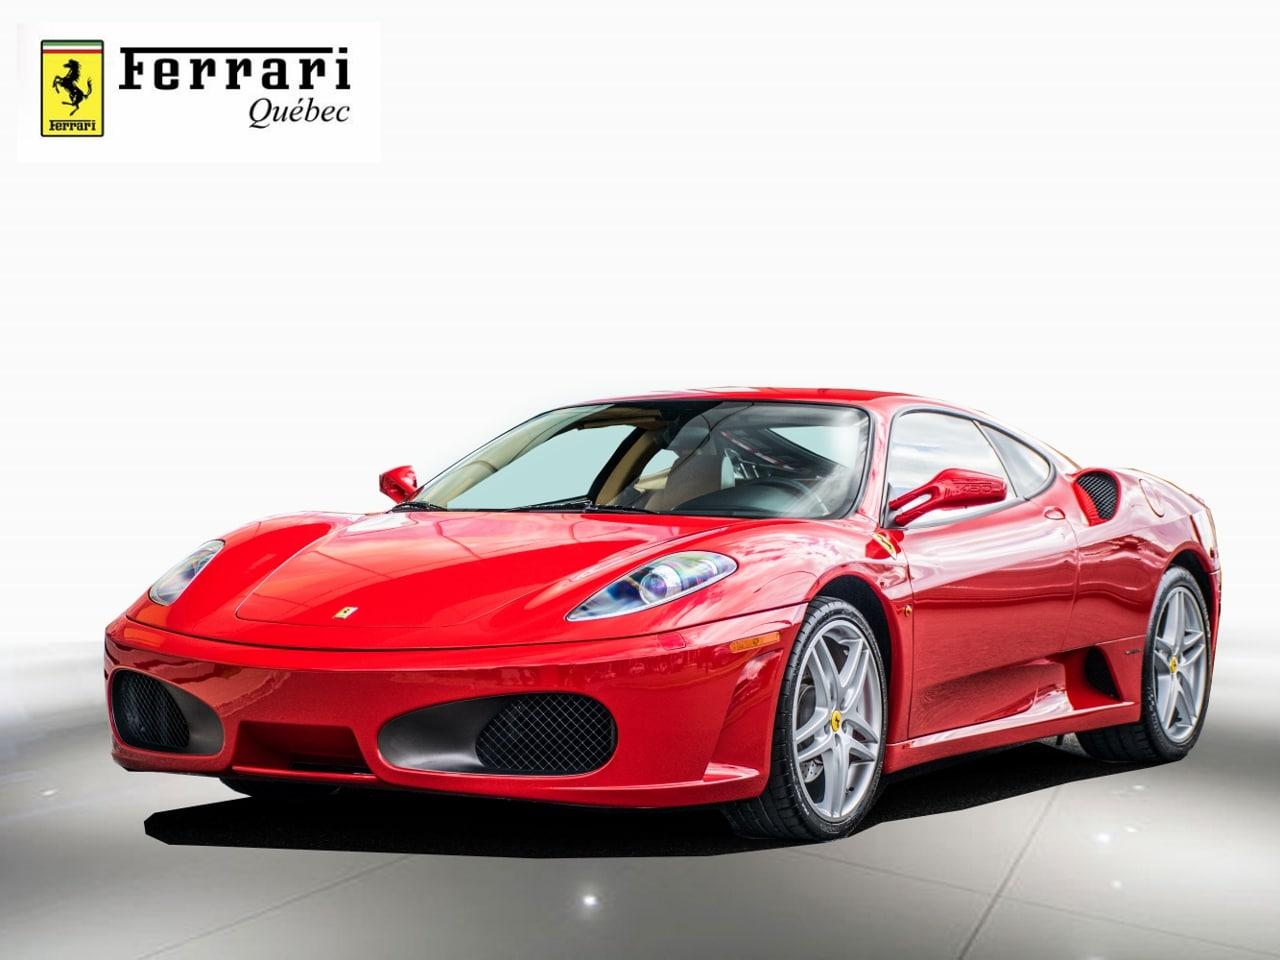 2005 Ferrari F430 Coupe F1 - VENDU/SOLD Coupé